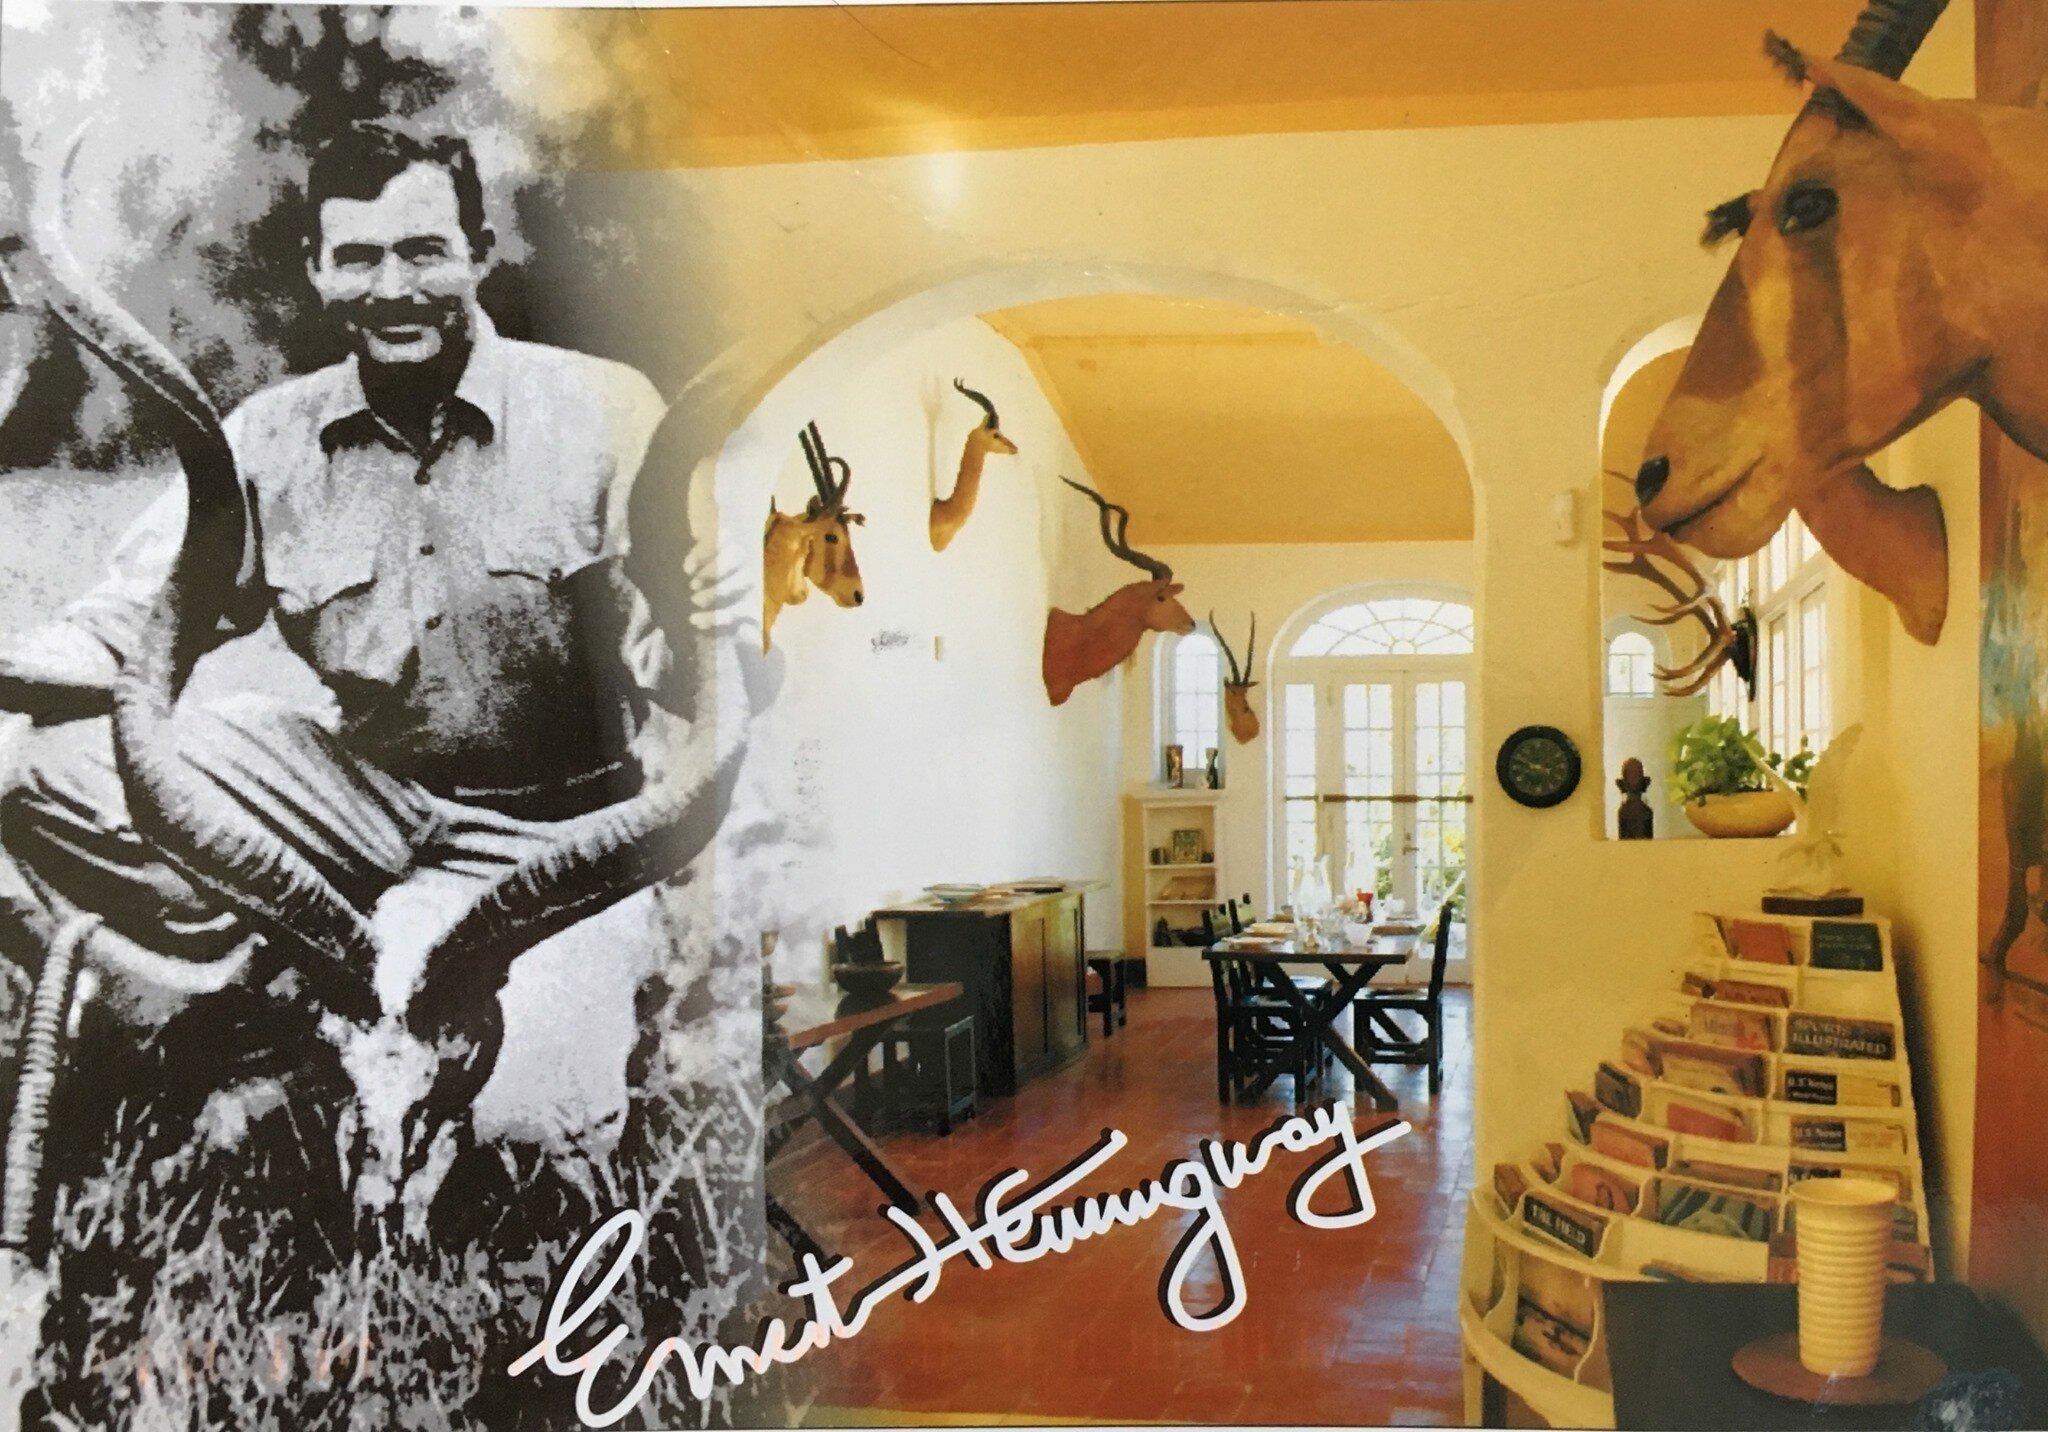 Hemingway 5.jpg